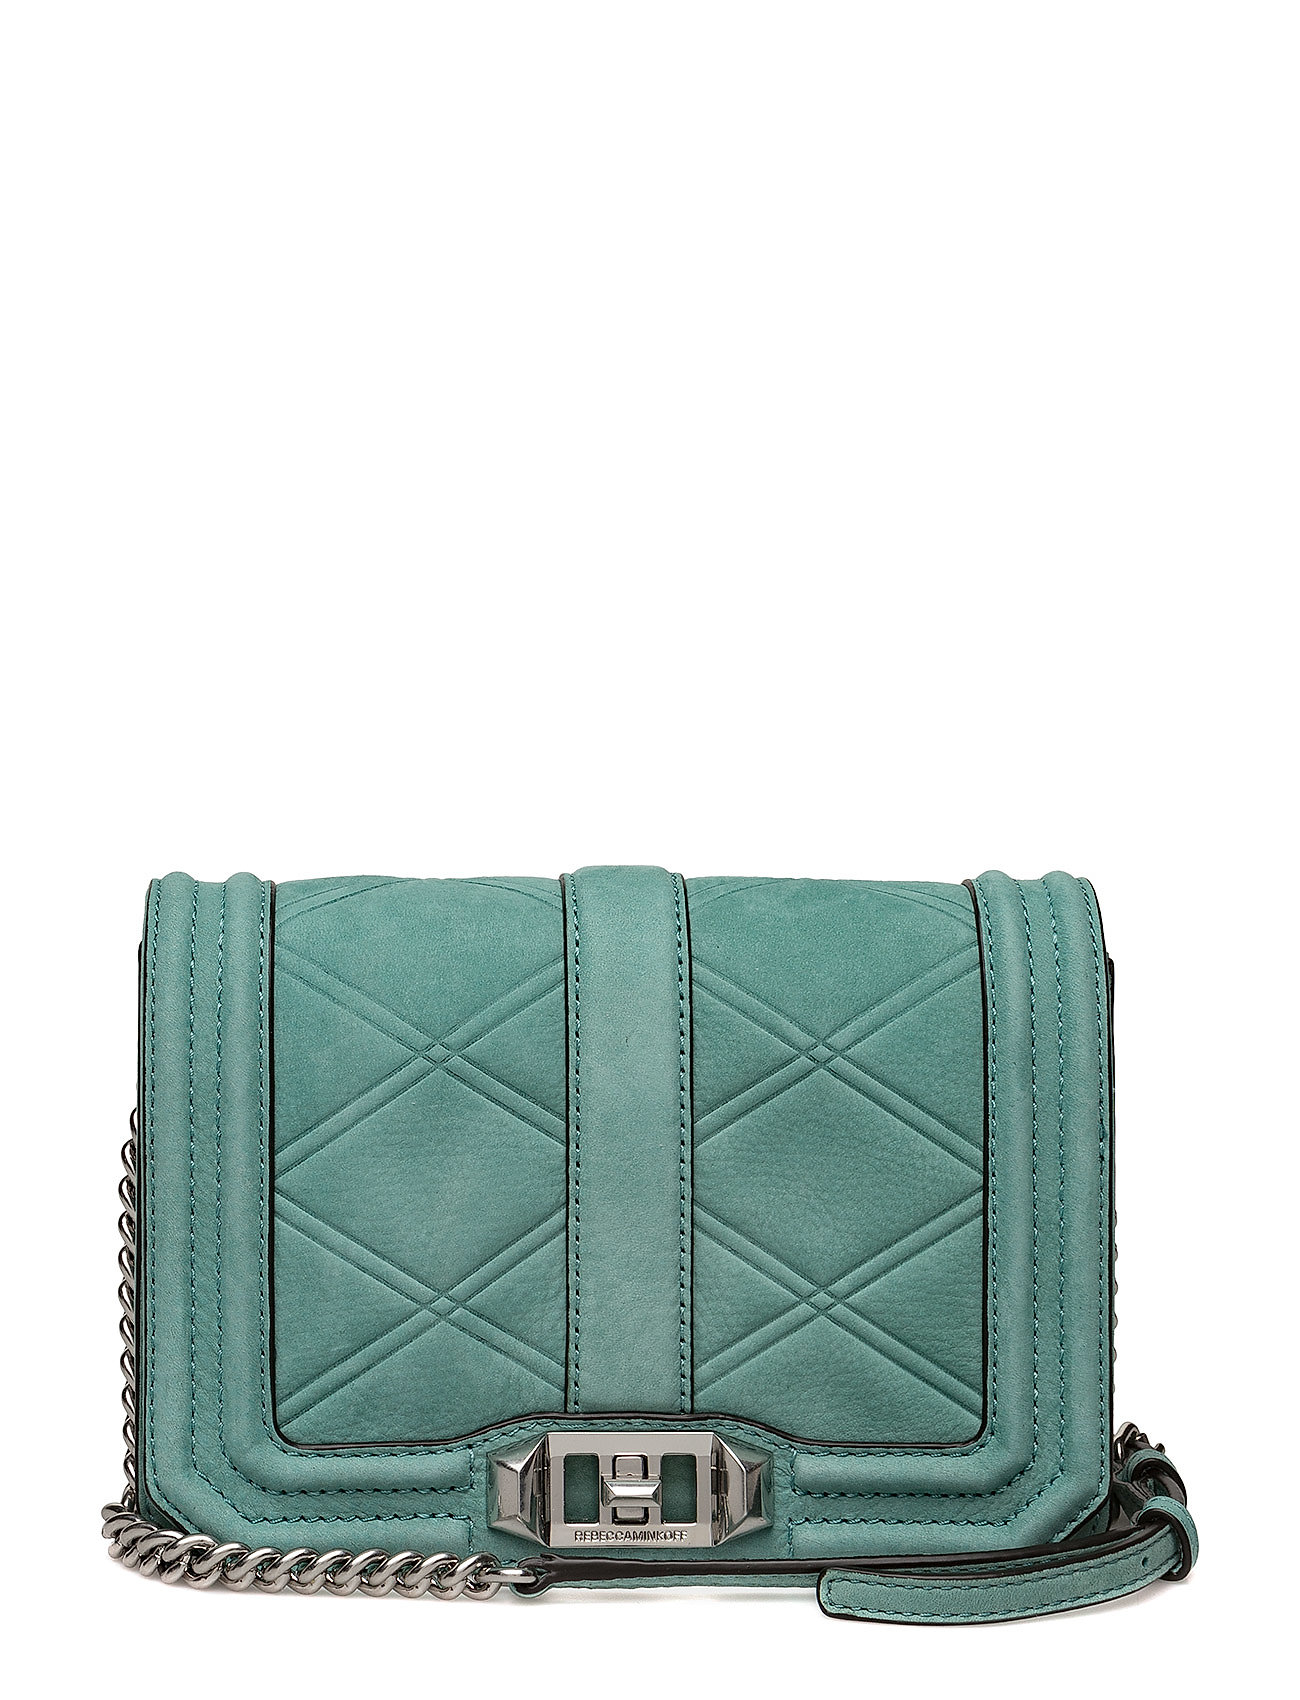 Small Love Crossbody Bag in Green Rebecca Minkoff 1GNyhwdDf